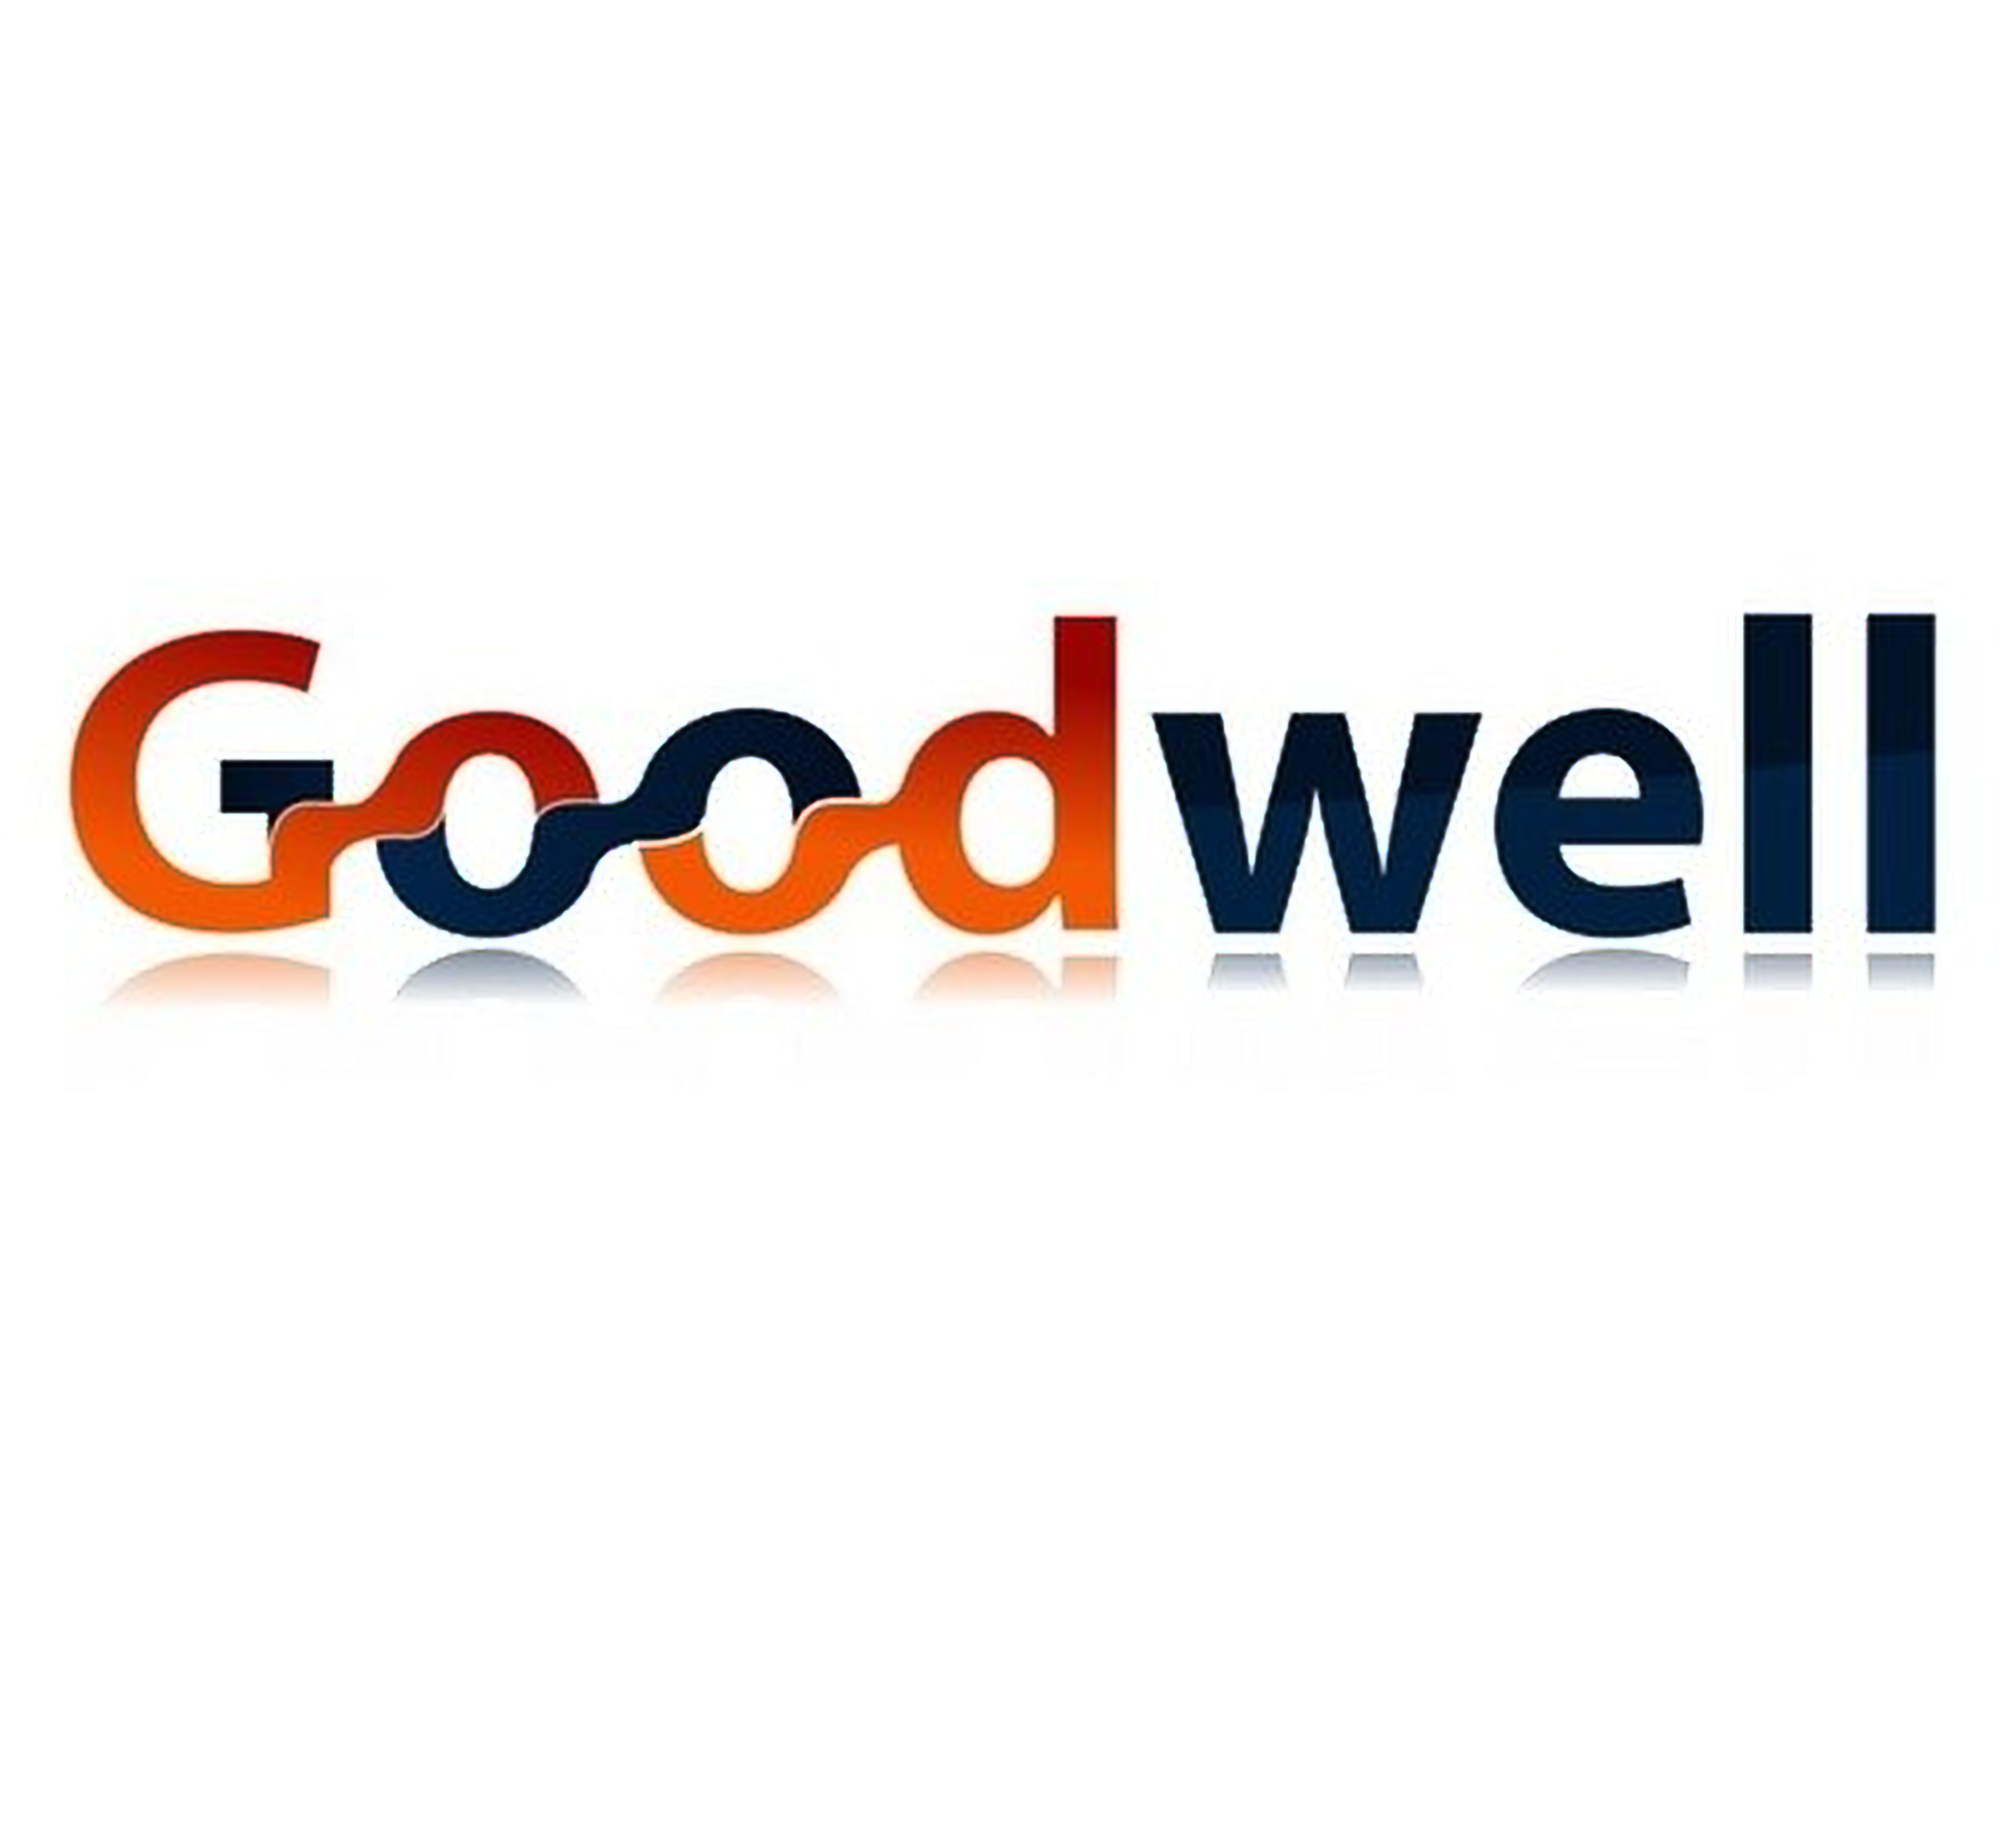 Photo of كيفية معالجة الشهرة (Good Well ) محاسبيا وكيفية حساب الشهرة بمنتهي السهولة